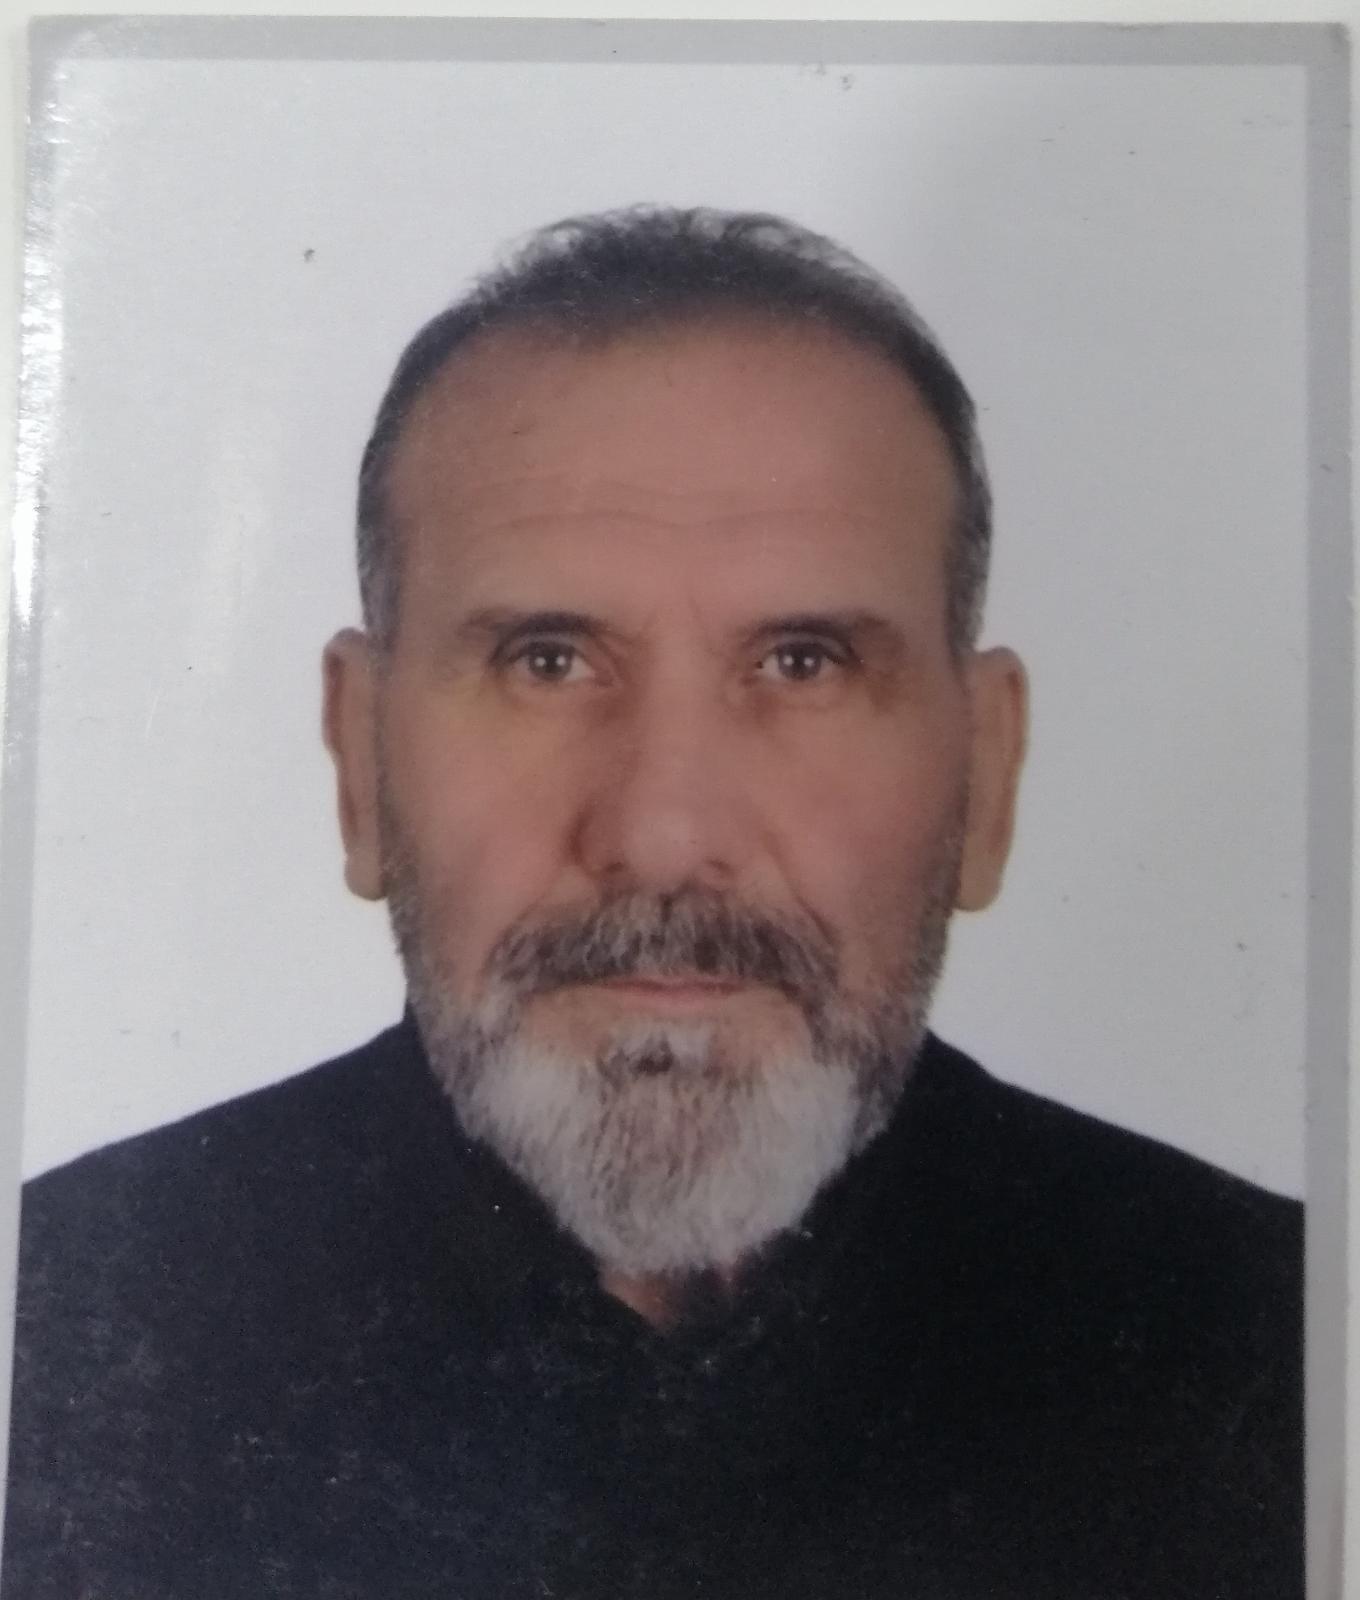 Abdulkerim Kurt